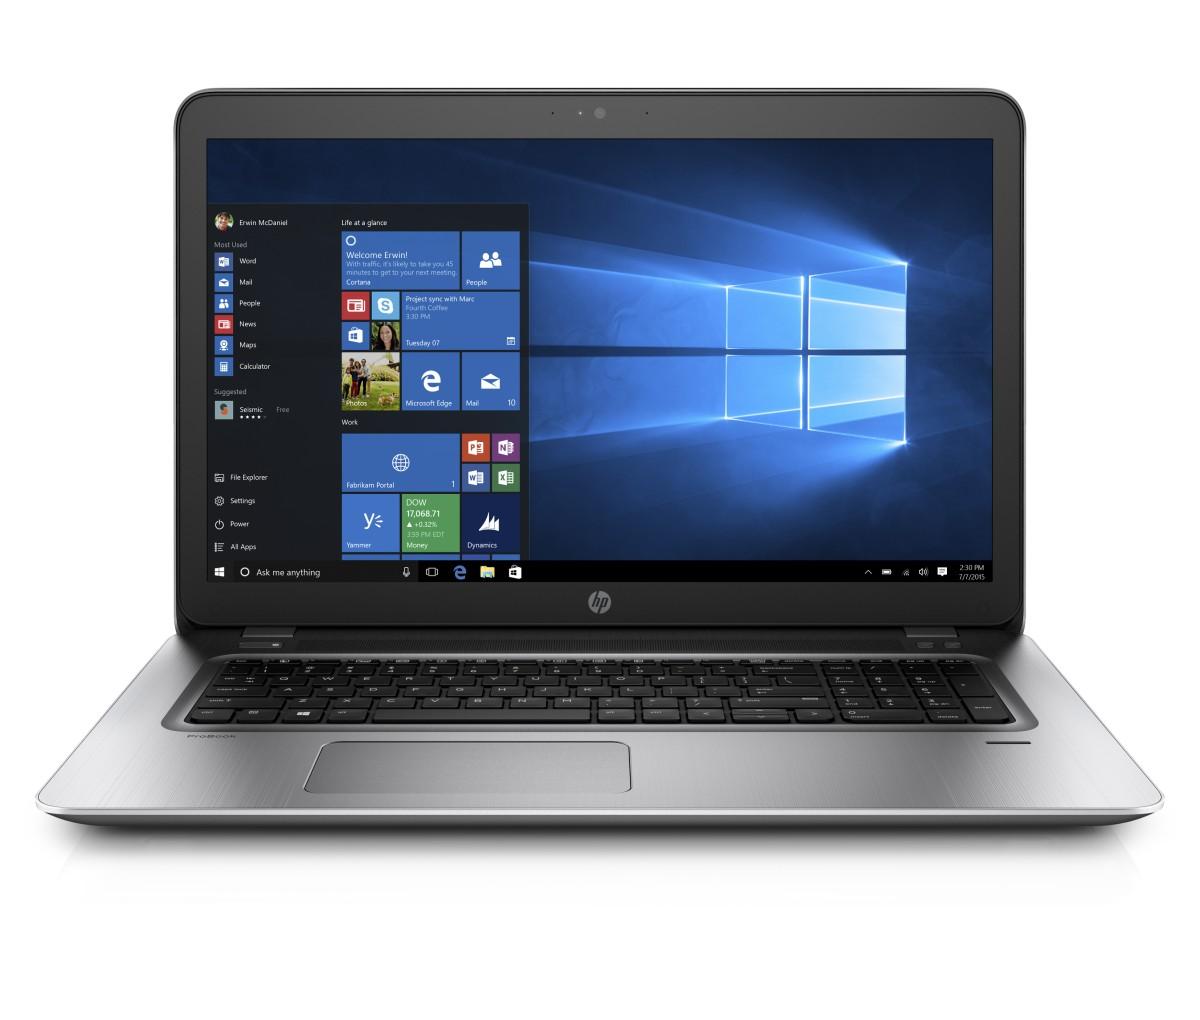 HP ProBook 470 G4 i5-7200U 17.3 FHD UWVA CAM, GF930MX/2G, 4GB,256GB+volny slot 2,5,DVDRW,FpR,ac,BT,Backlit kbd, Win10Pro